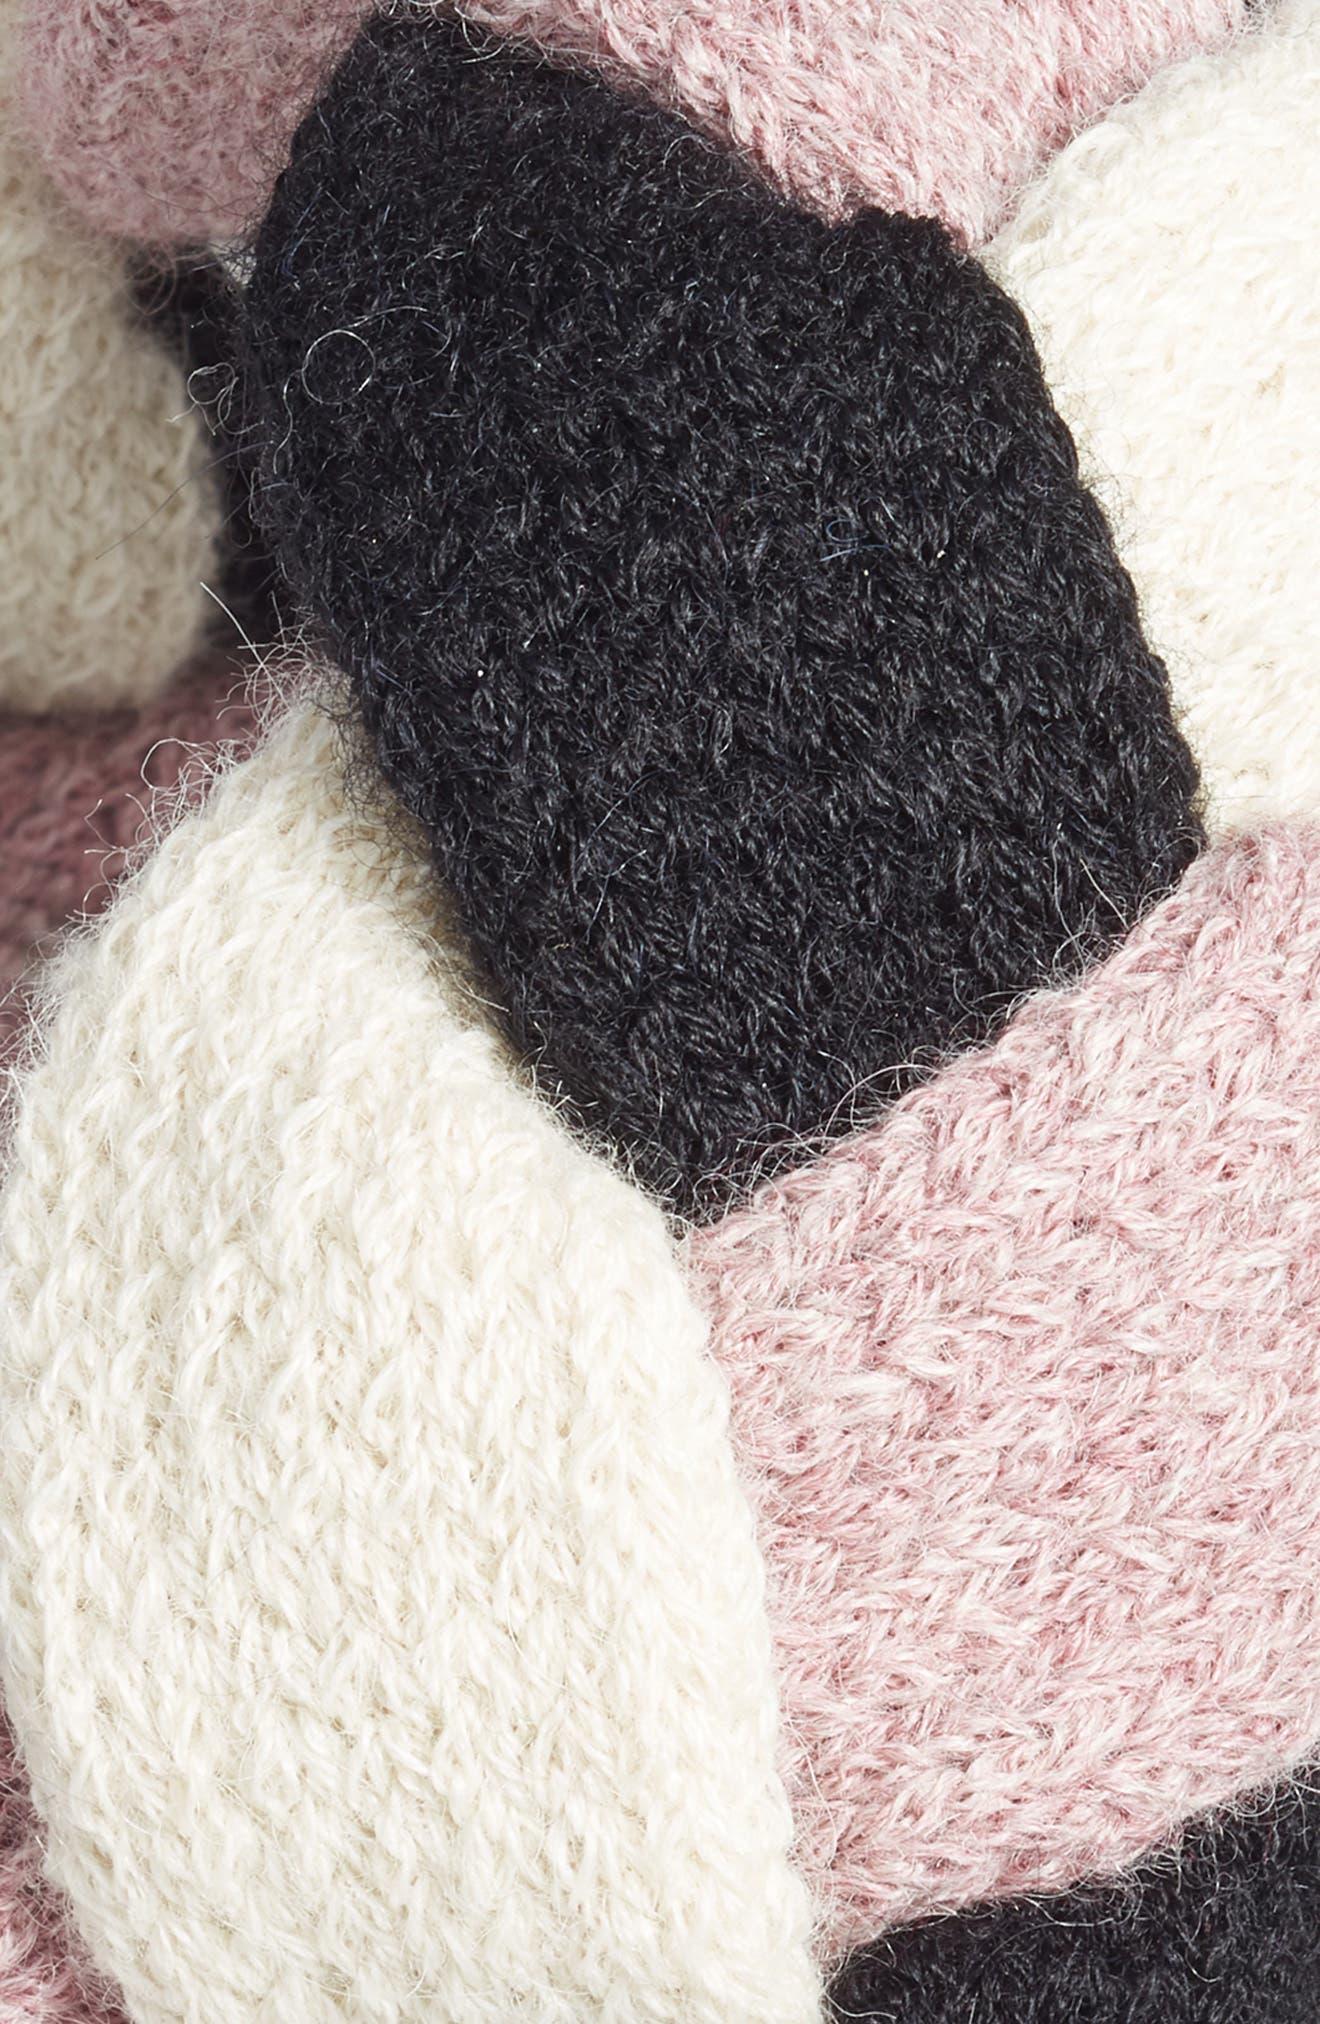 Ann Alpaca Braided Headband,                             Alternate thumbnail 2, color,                             BLACK/ WHITE/ ROSE